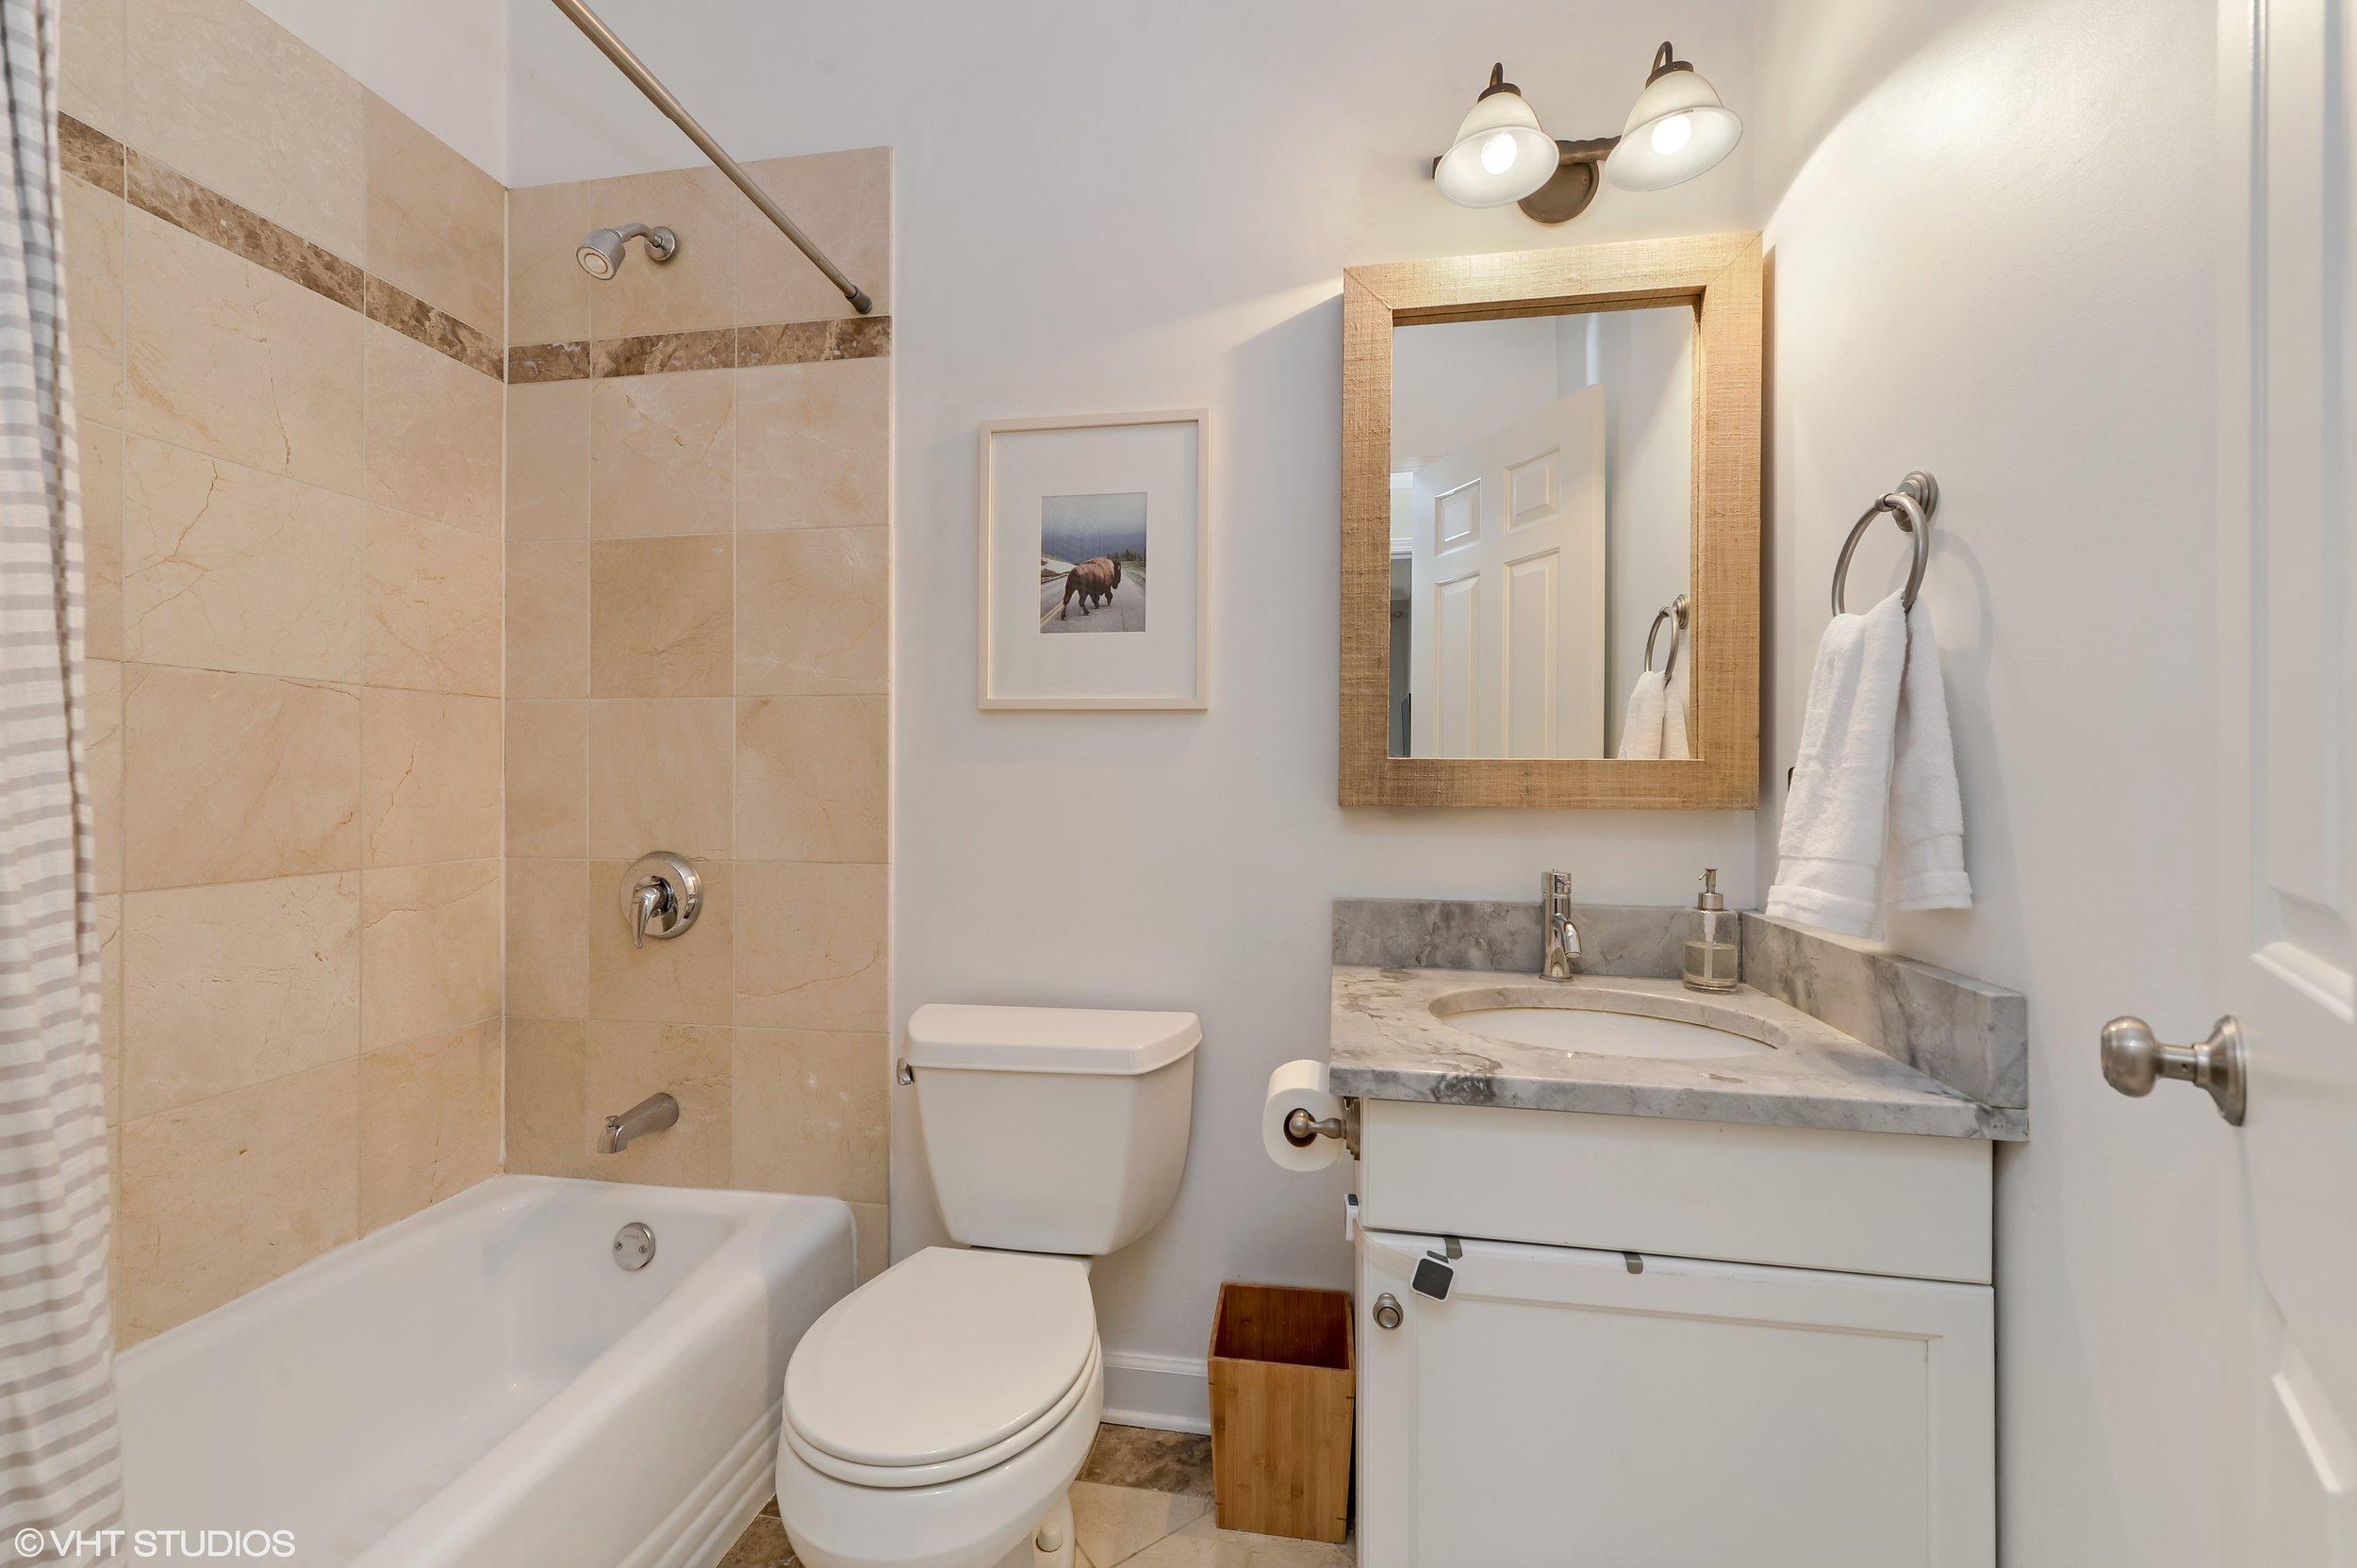 12_3205NorthHoyneAve_1B_8_Bathroom_HiRes.jpg